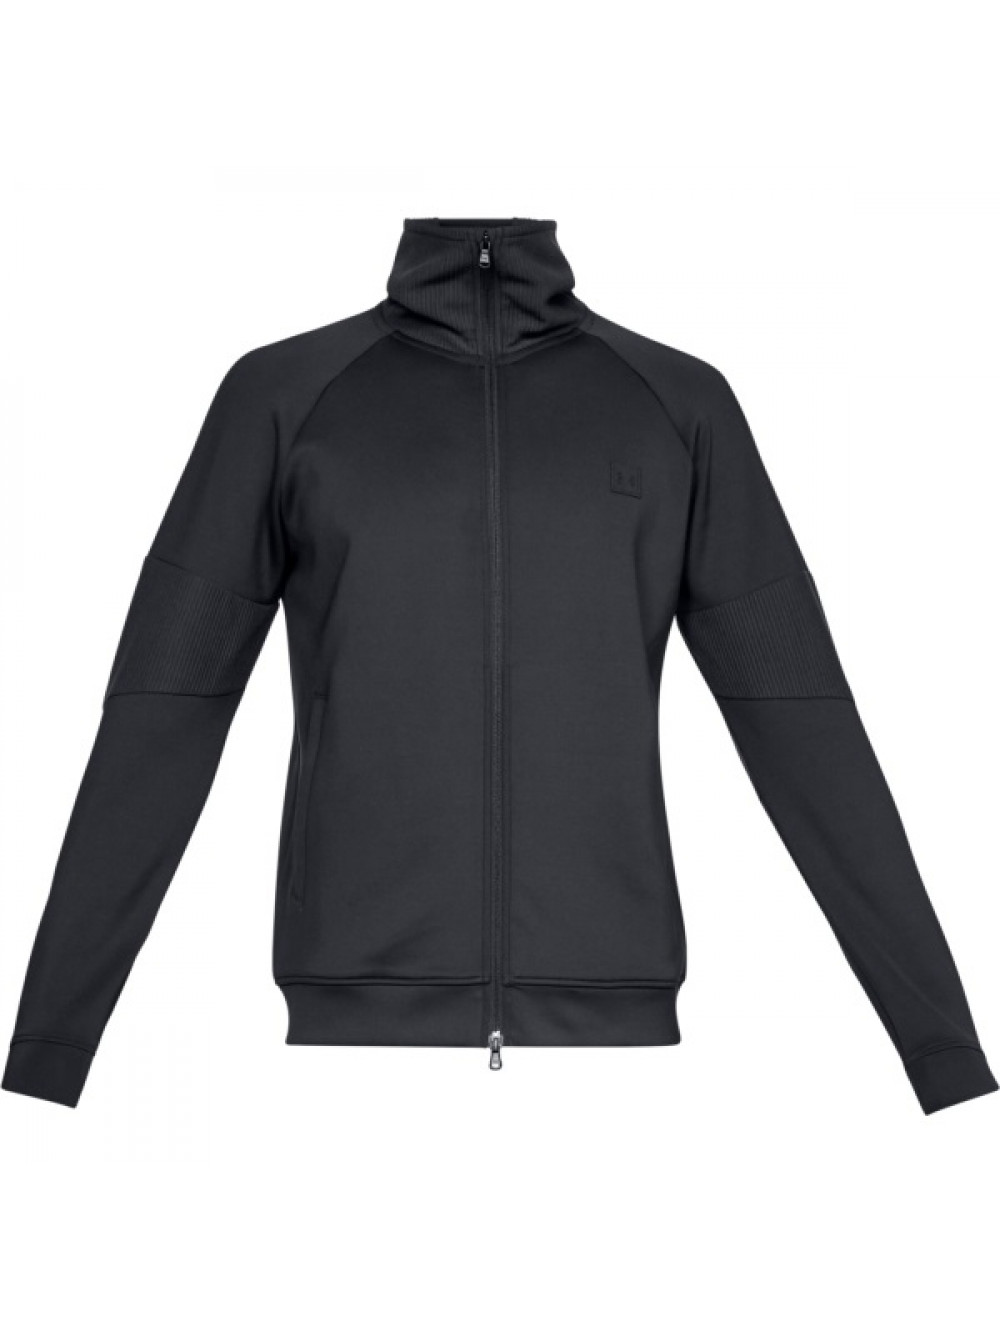 Pánska bunda Under Armour Perpetual Track Jacket Čierna